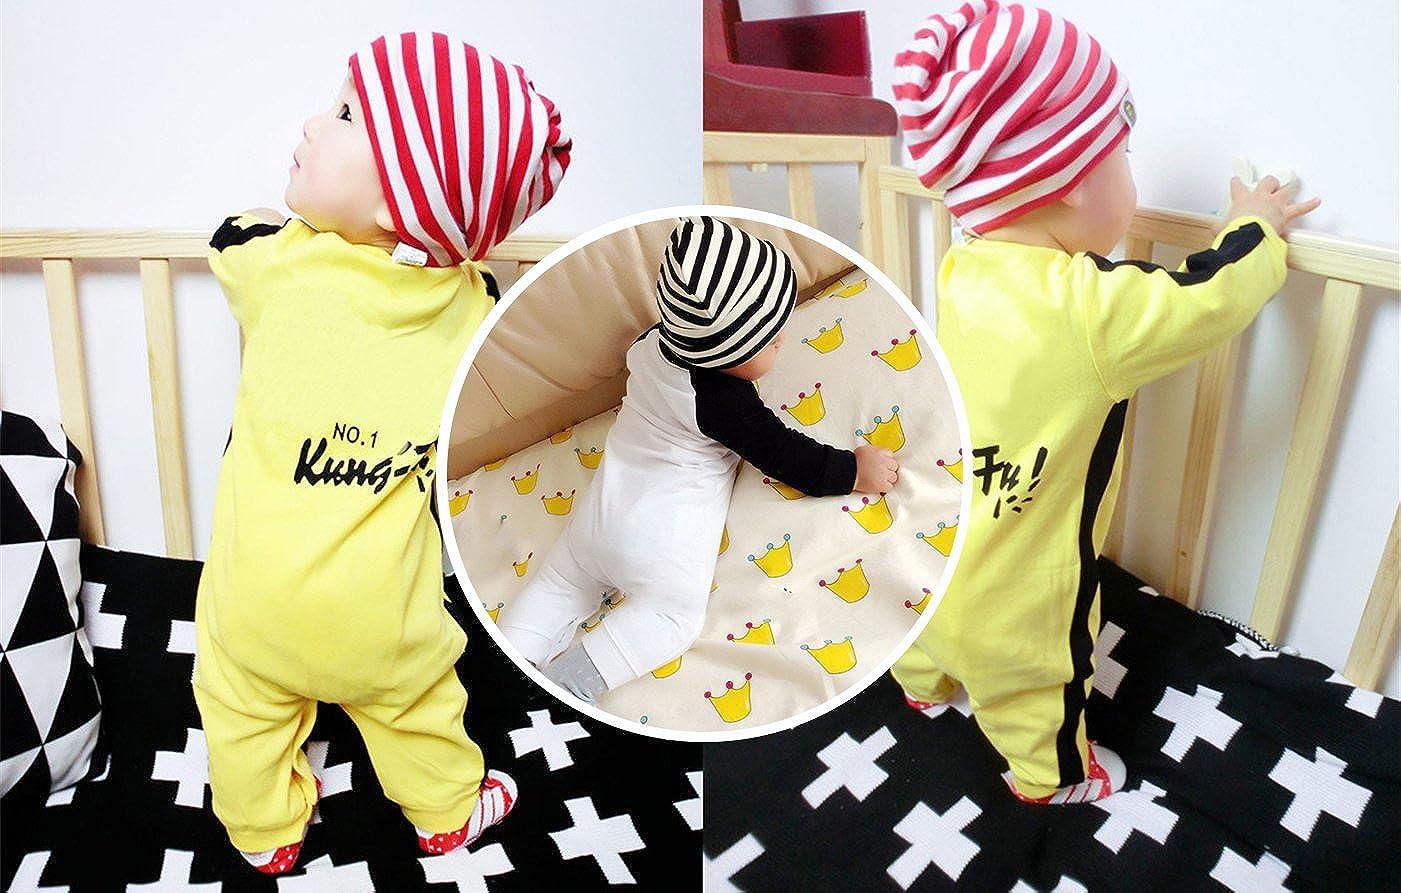 YJ-WAN Toddler Baby Beanie Infant Kids Children Soft Hat Cute Lovely Knit Cap